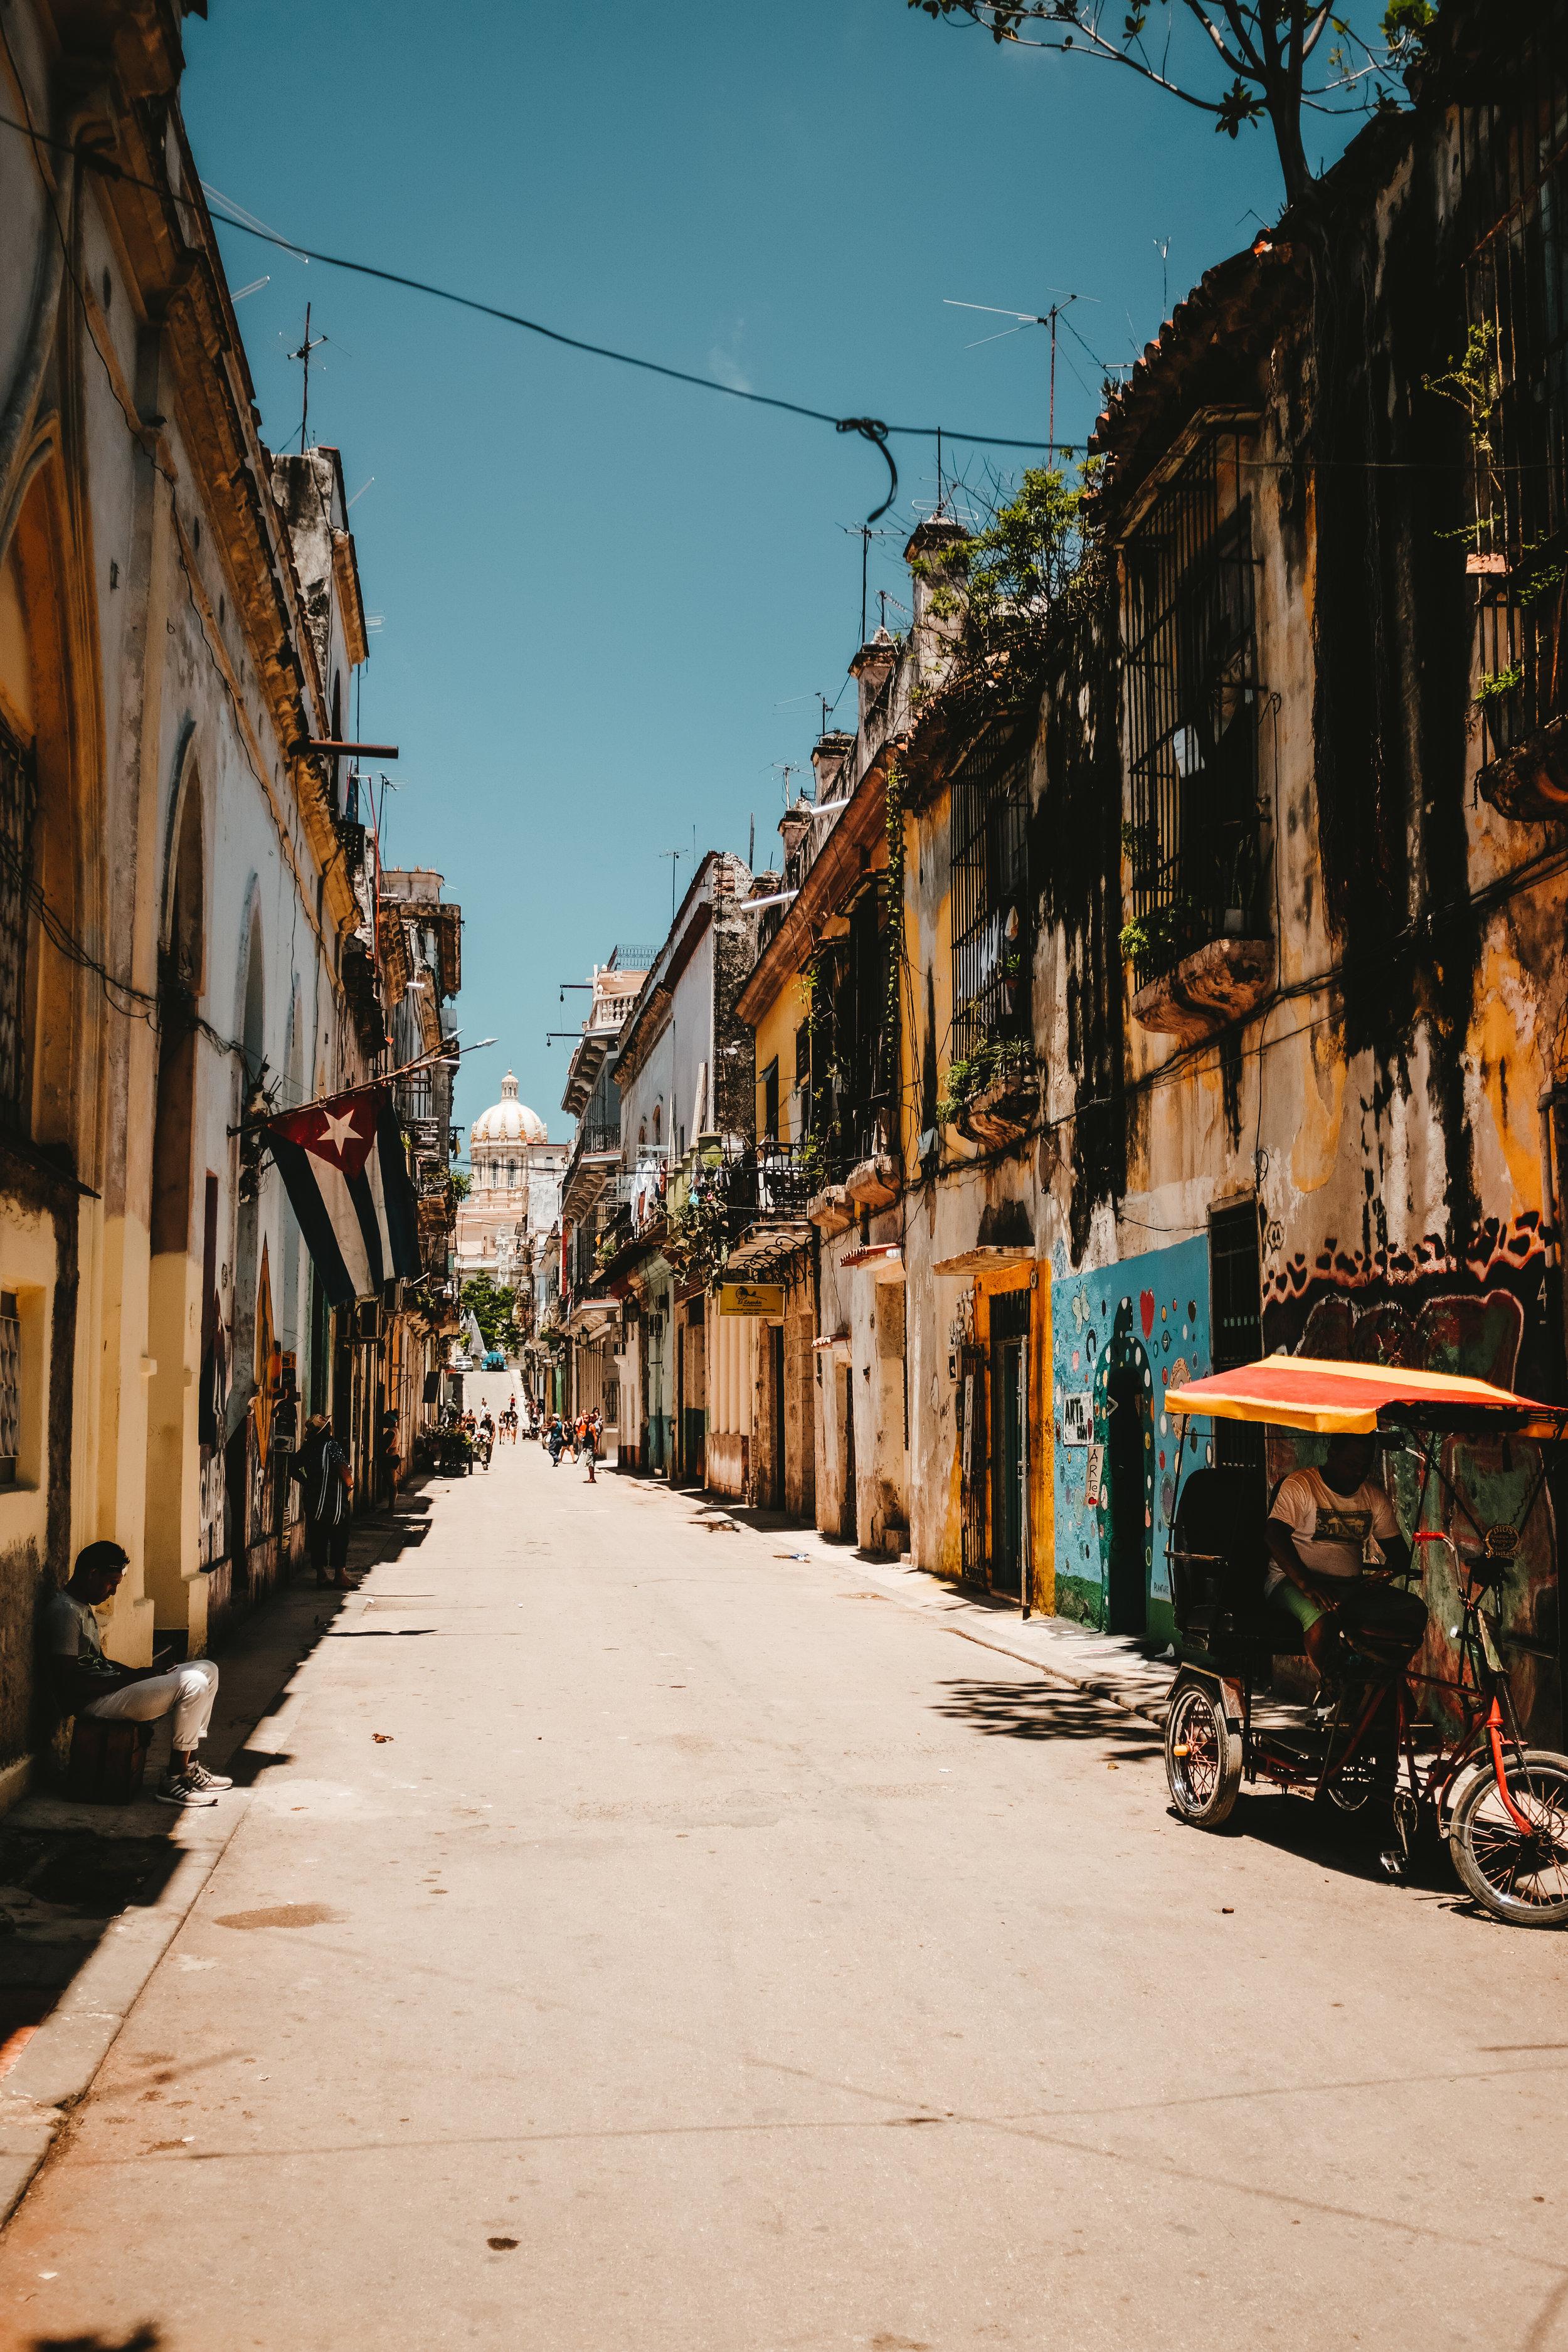 Consciously+Connected+Travel++-++Culturally+Connected+Experiences++-+Cultured+Connections+Experiences+-+Experience+|+Ernest+Hemingway+in+Havana+-+El+Floridita+-+Havana,+Cuba-4.jpeg